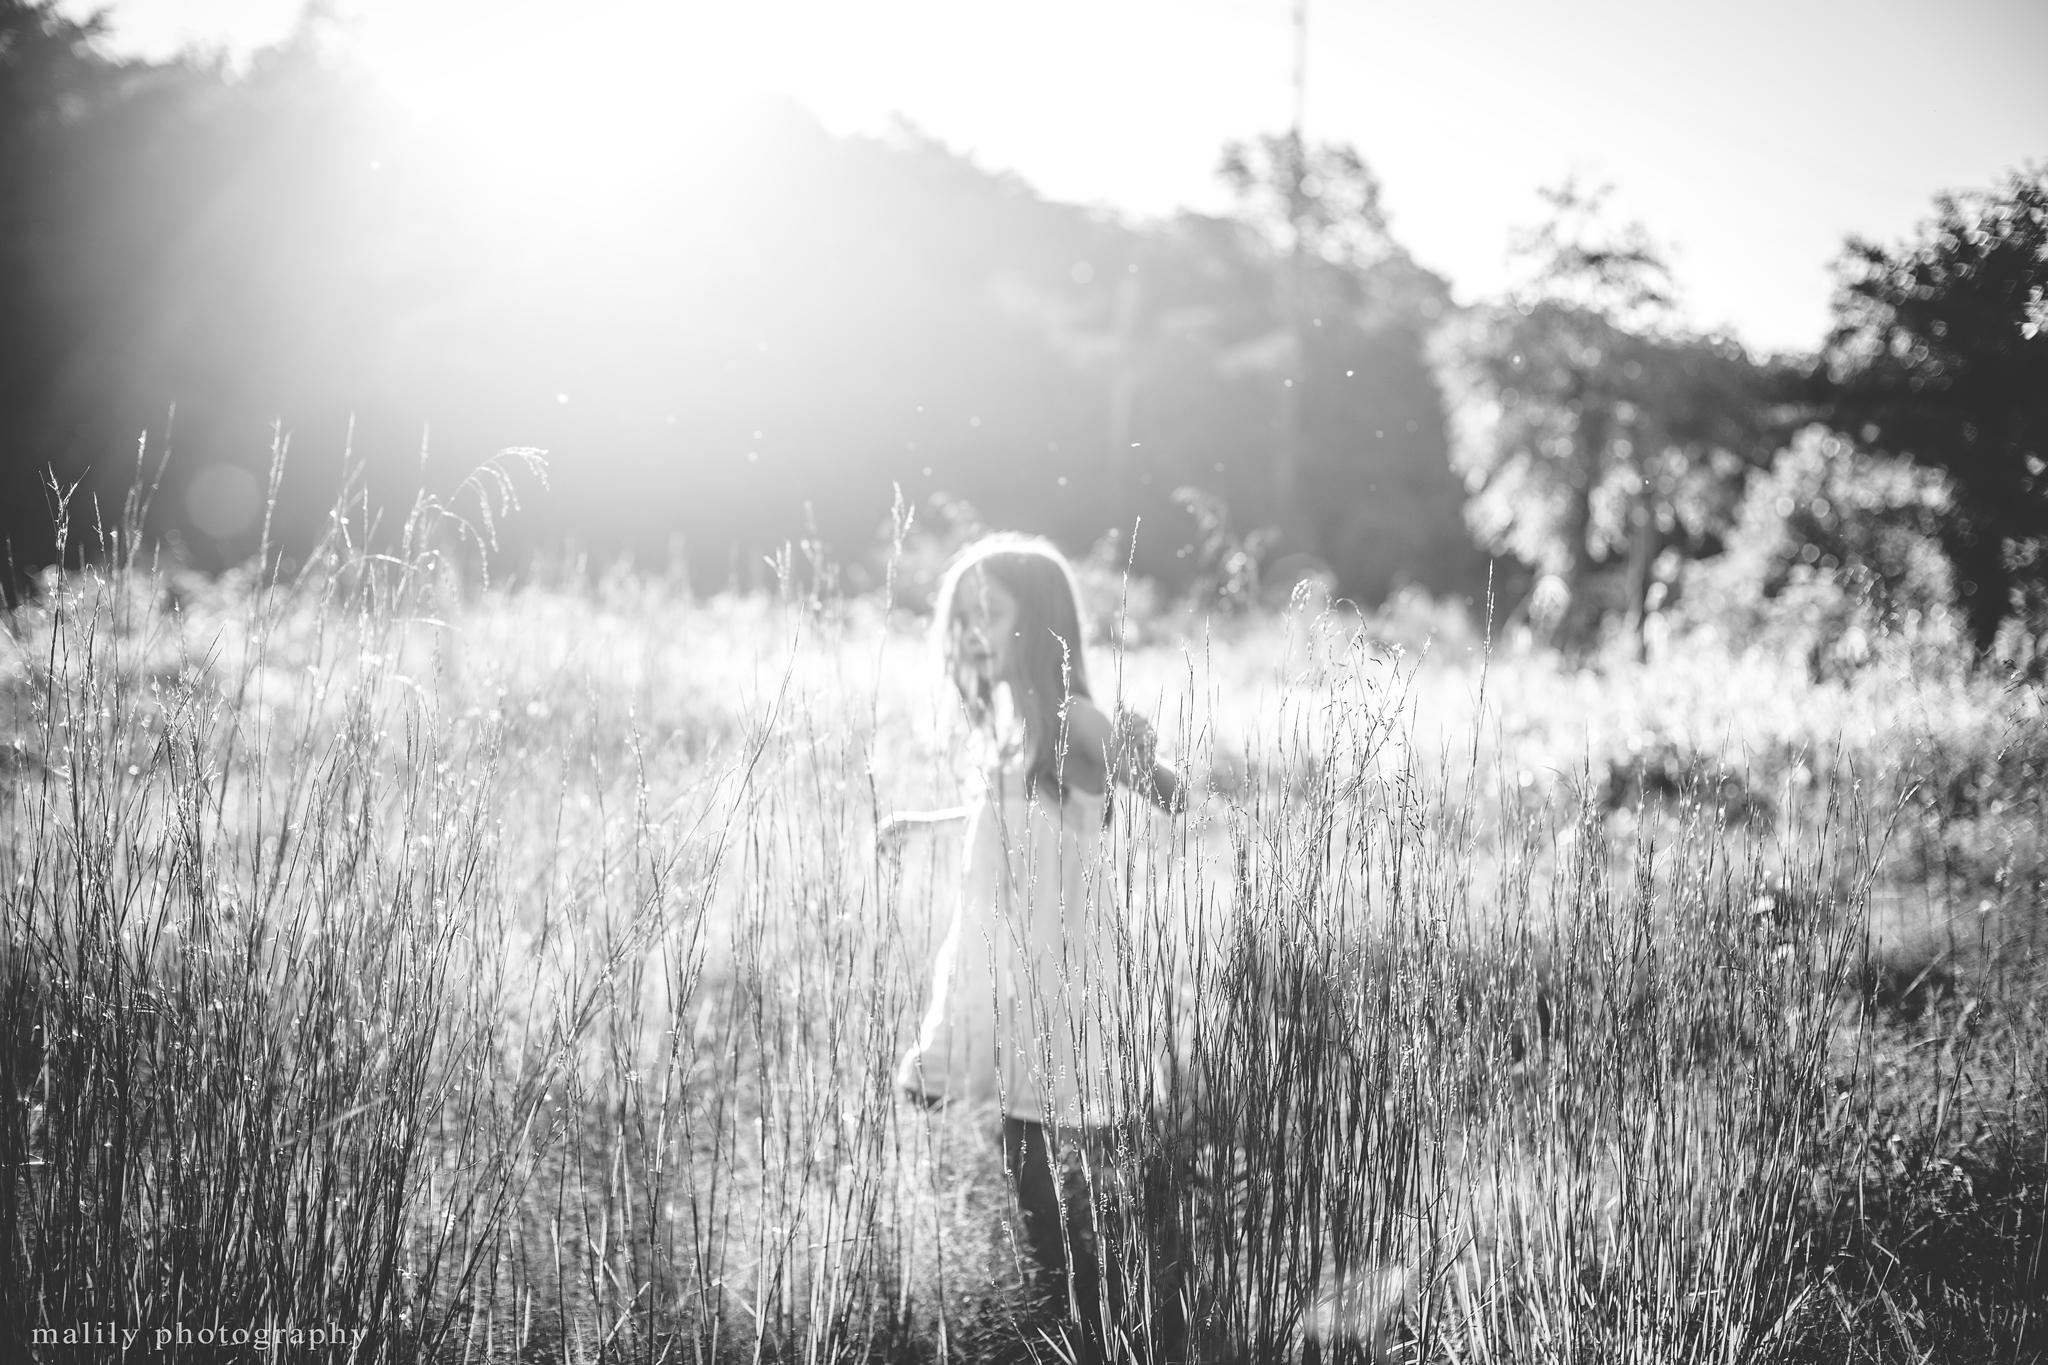 malily photography | Berks County Child Photographer